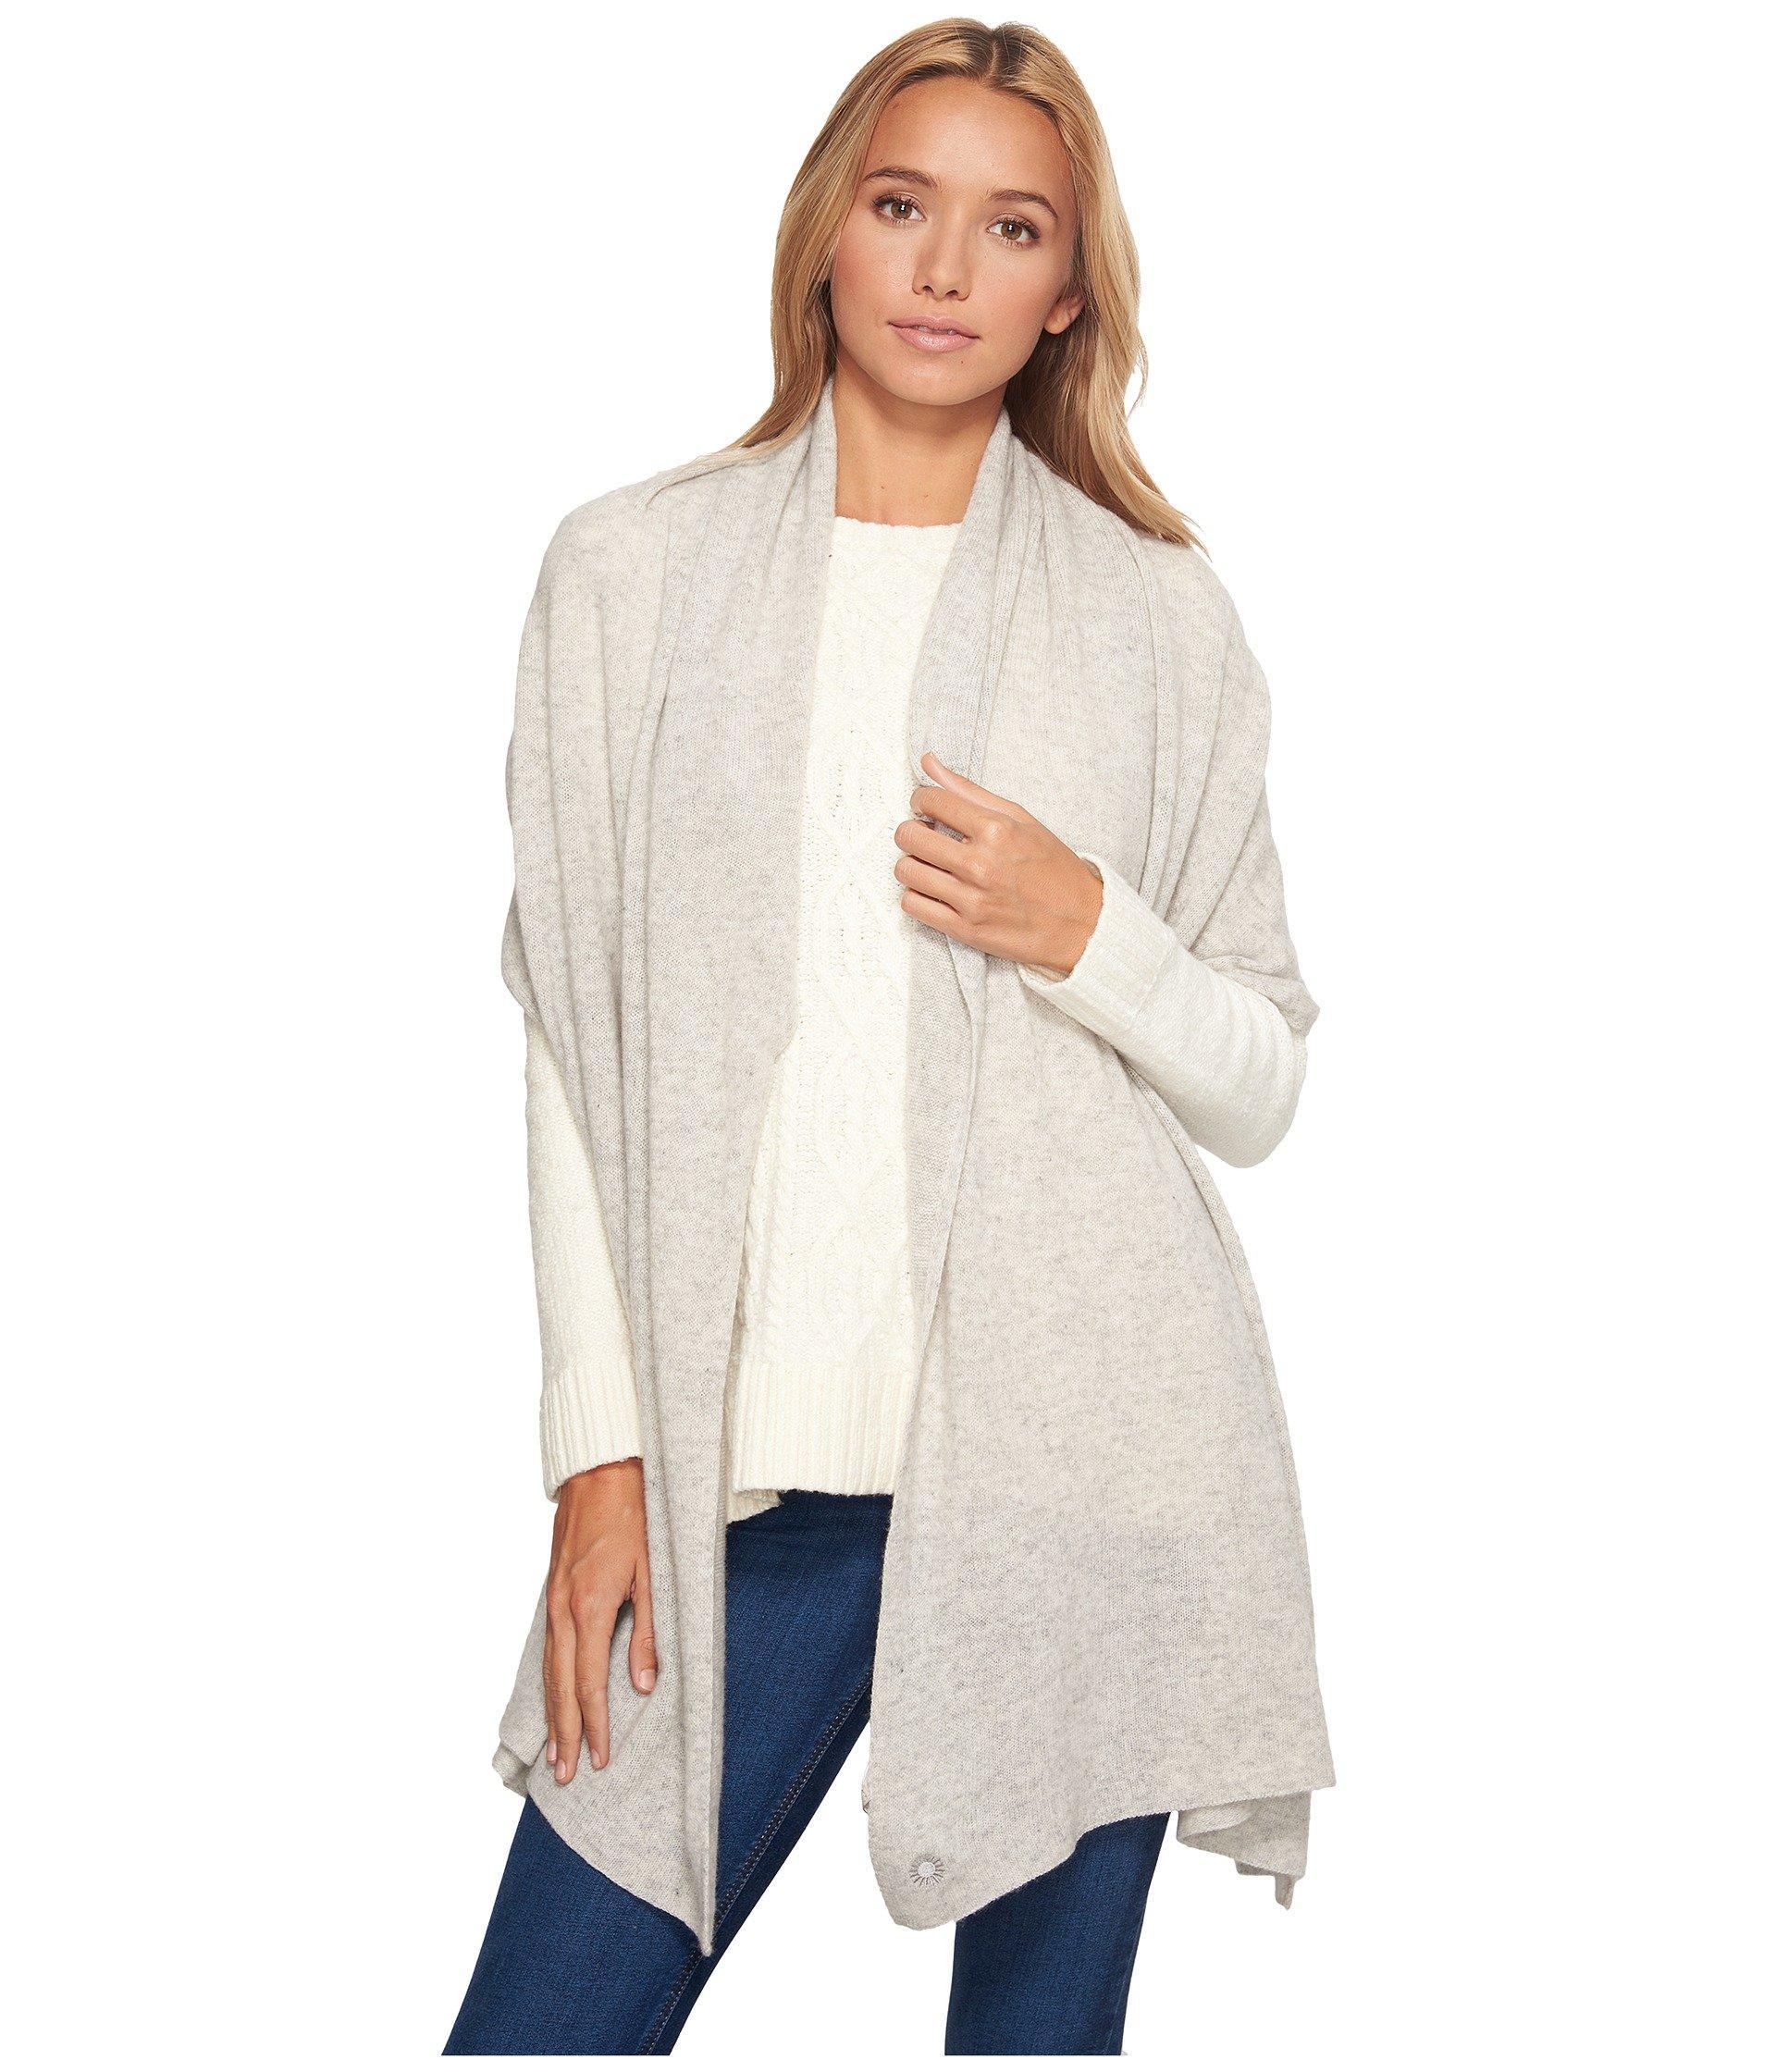 Ugg Luxe Oversized Wrap, Light Grey Heather